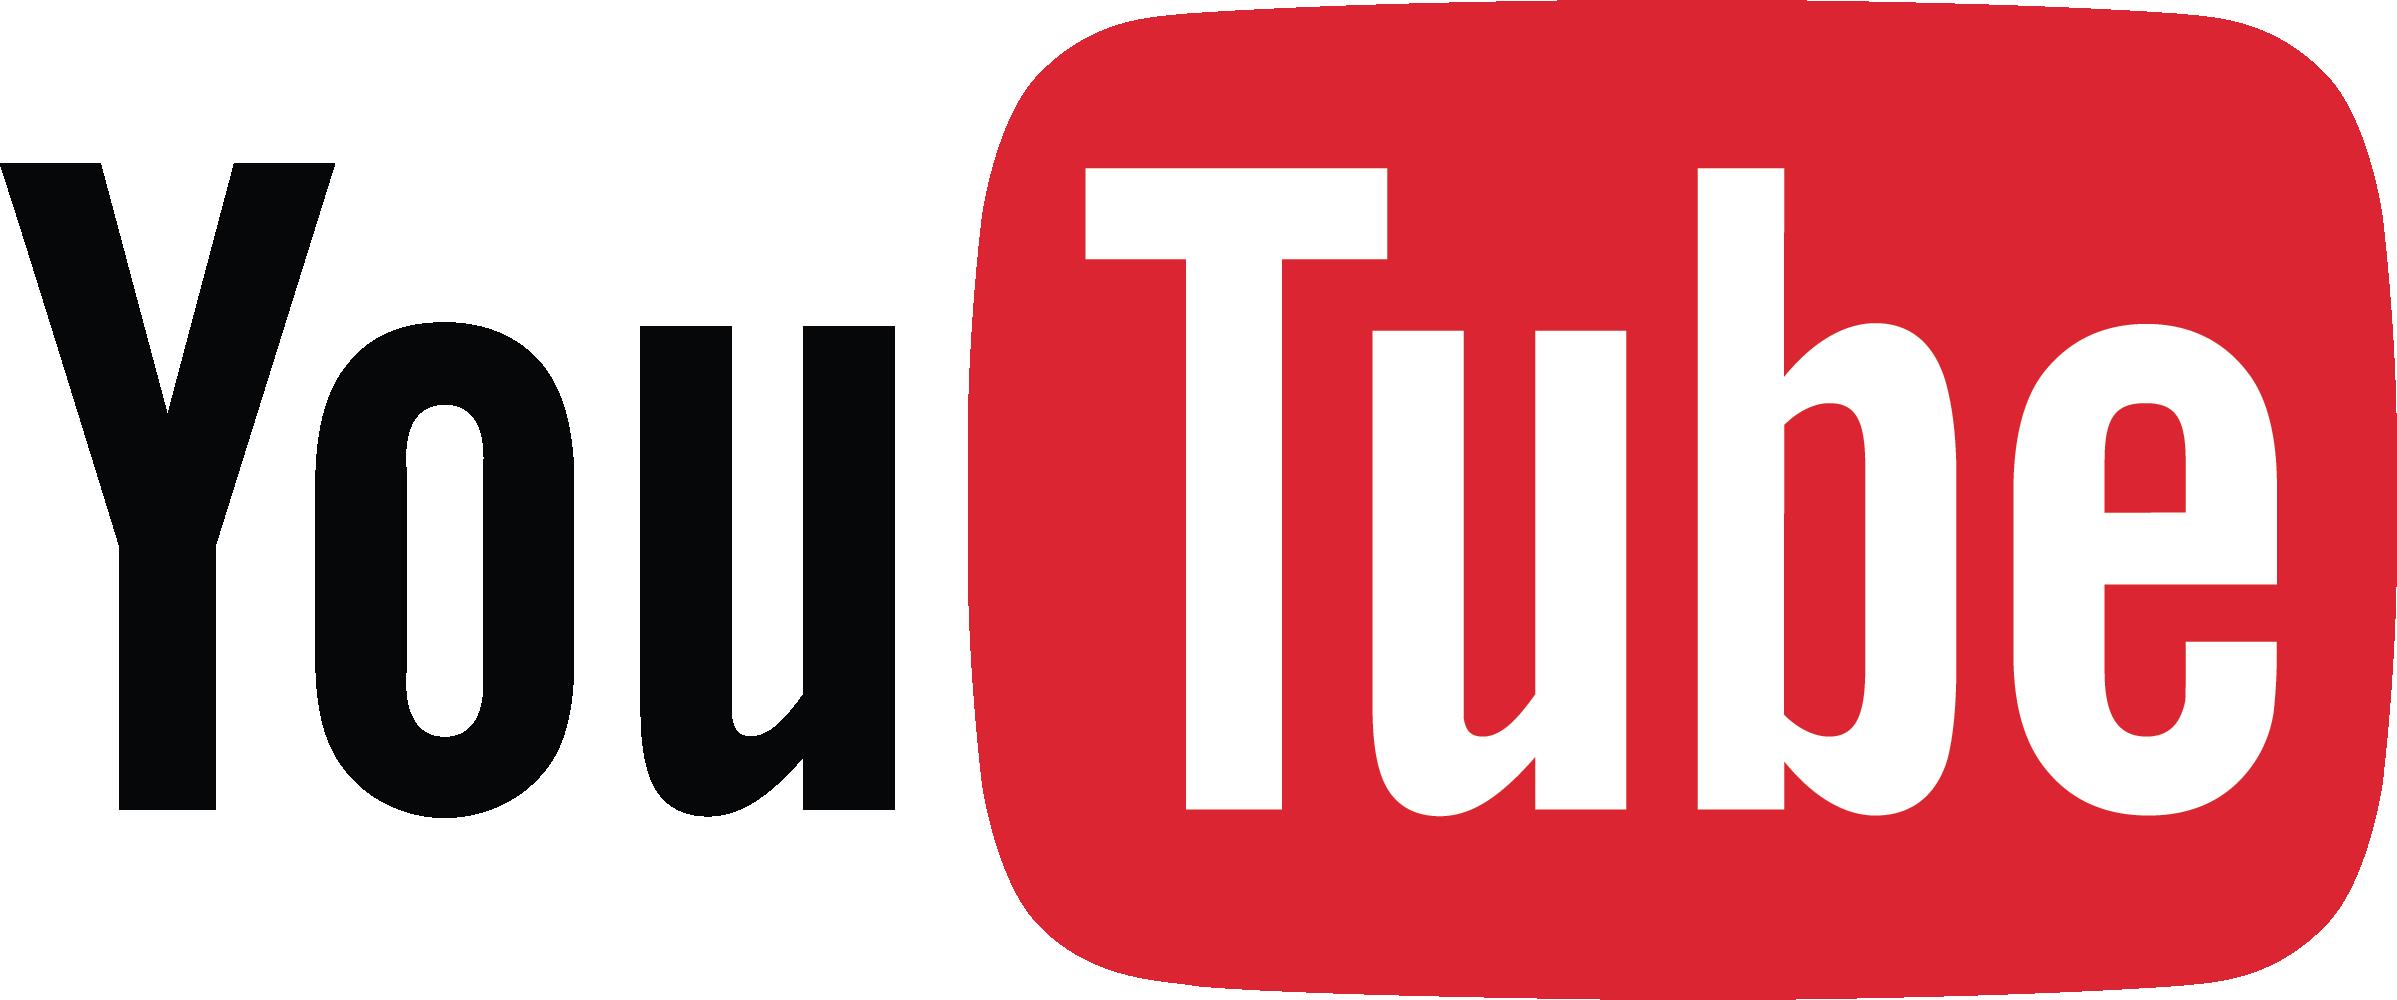 2397x1000 Youtube Flat Logo